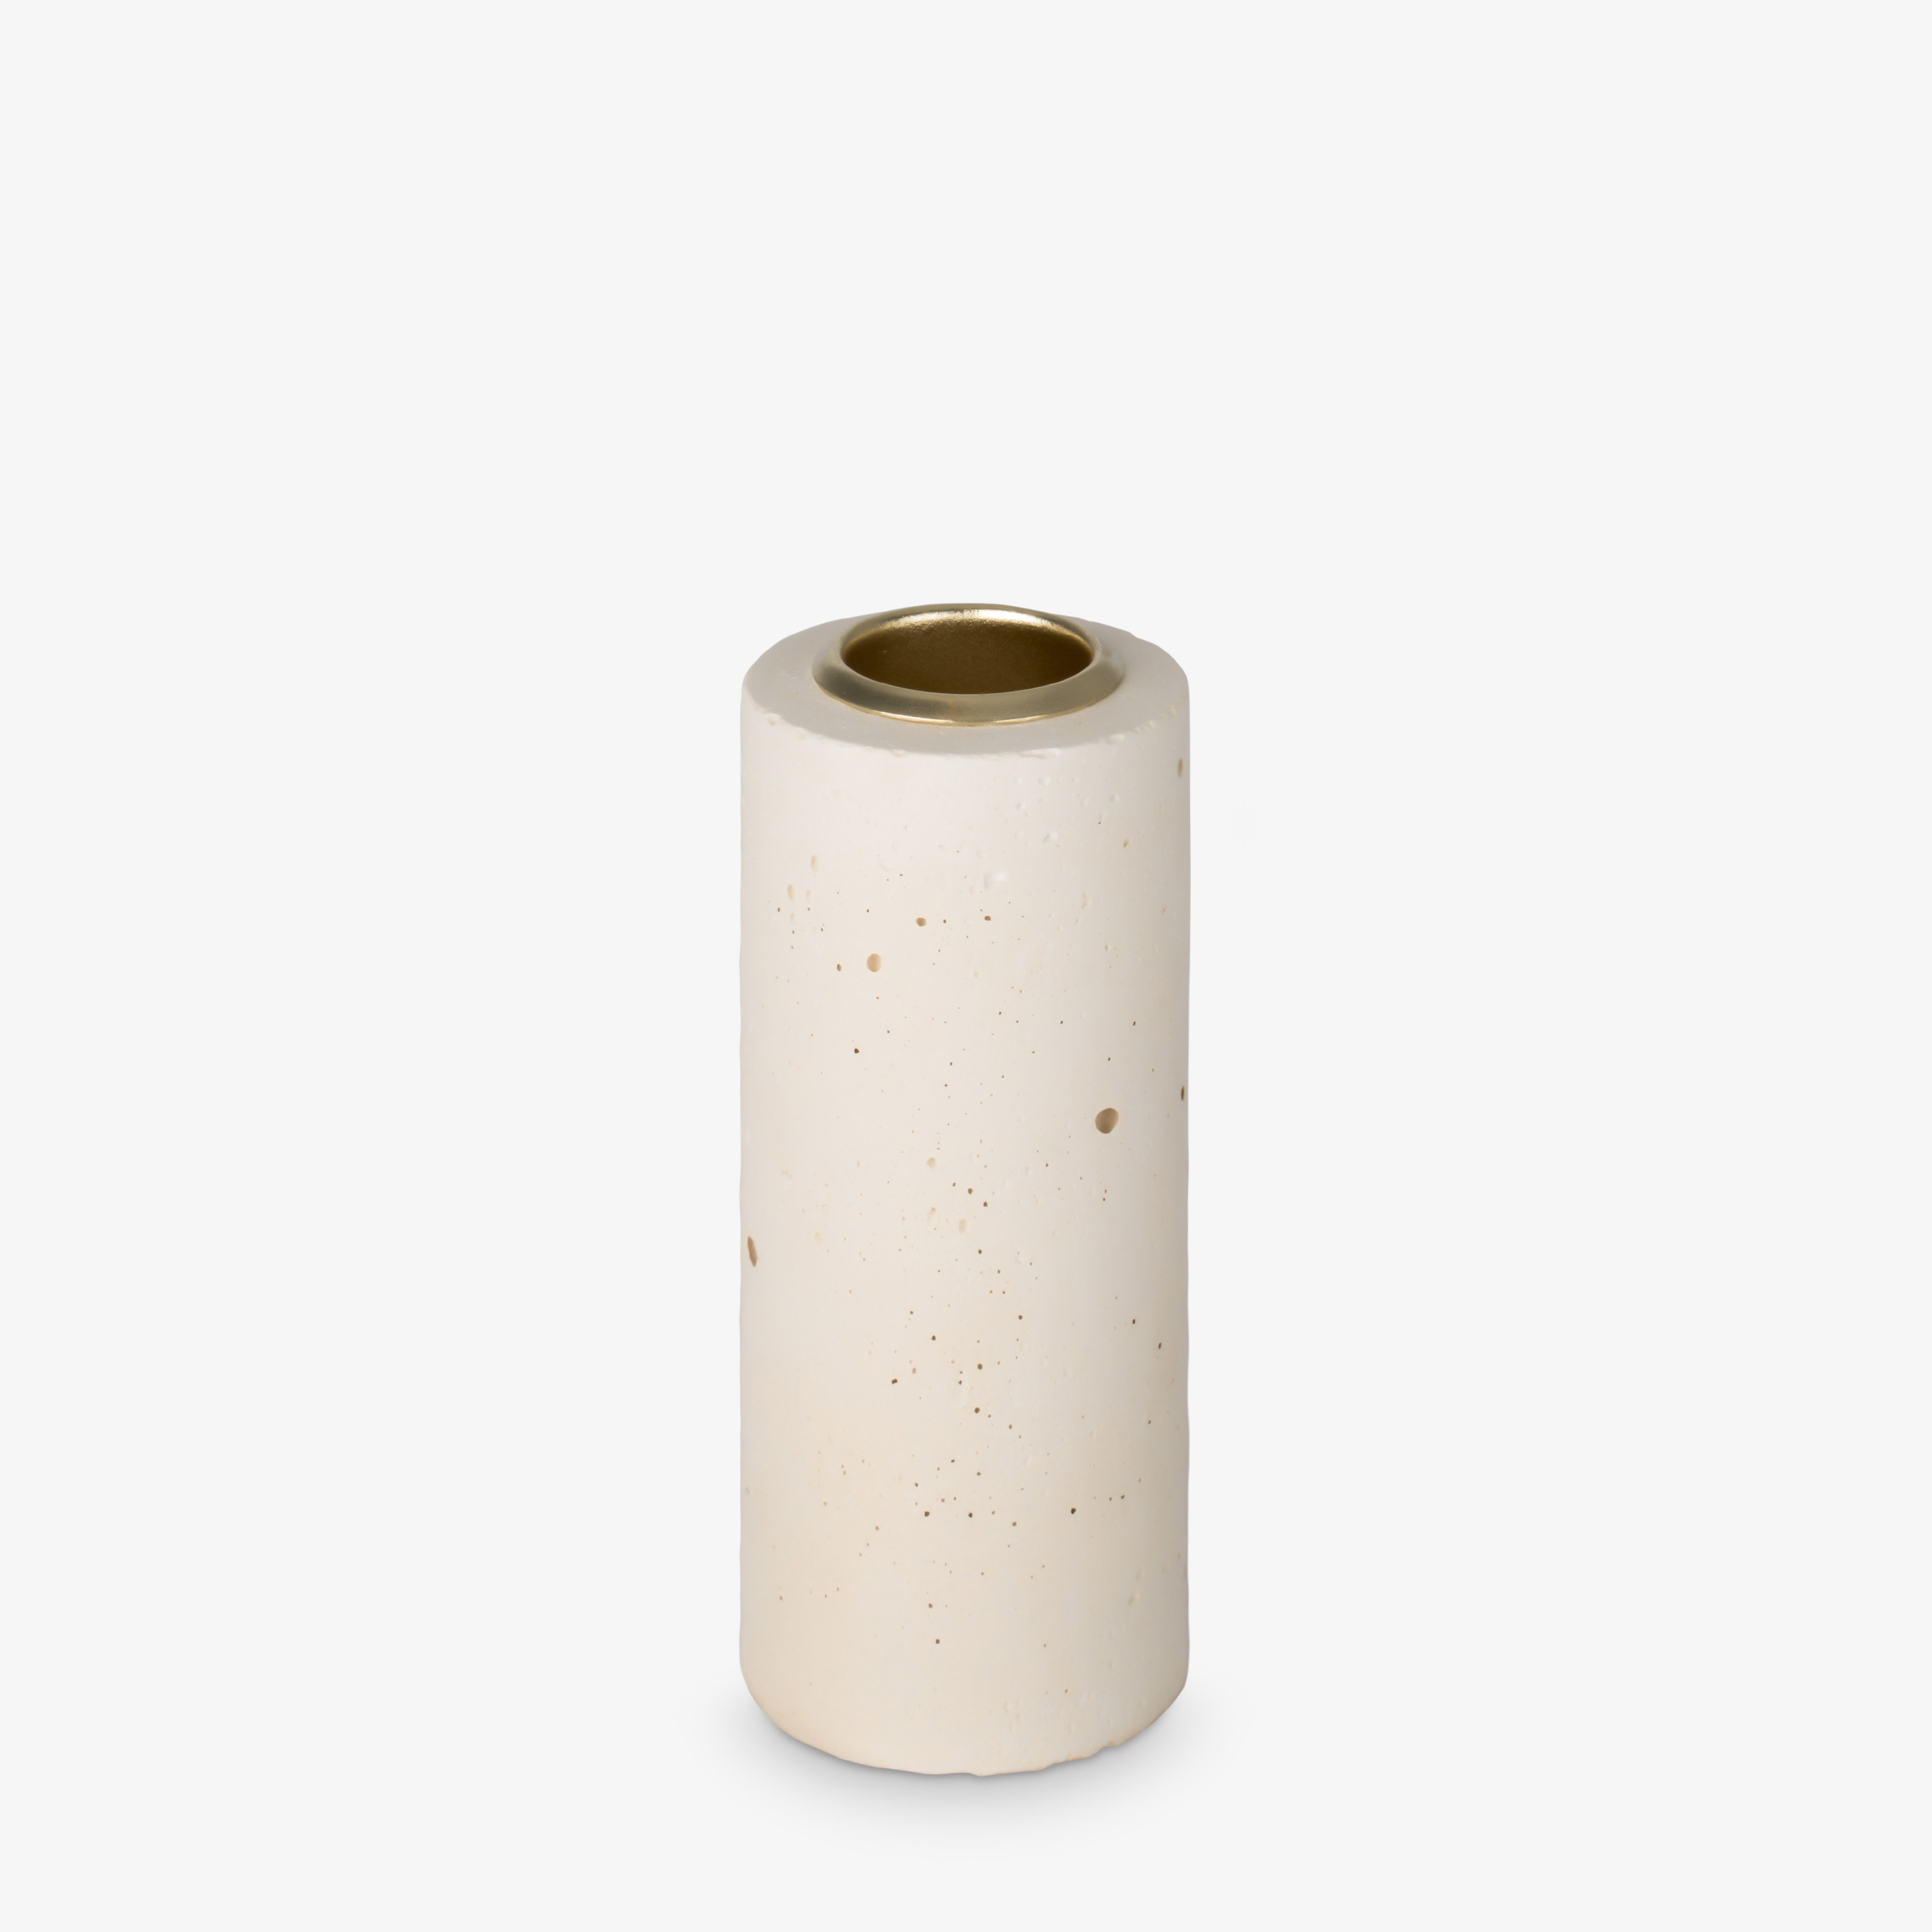 Kerzenhalter Tower 10x4 cm | Pastellgelb